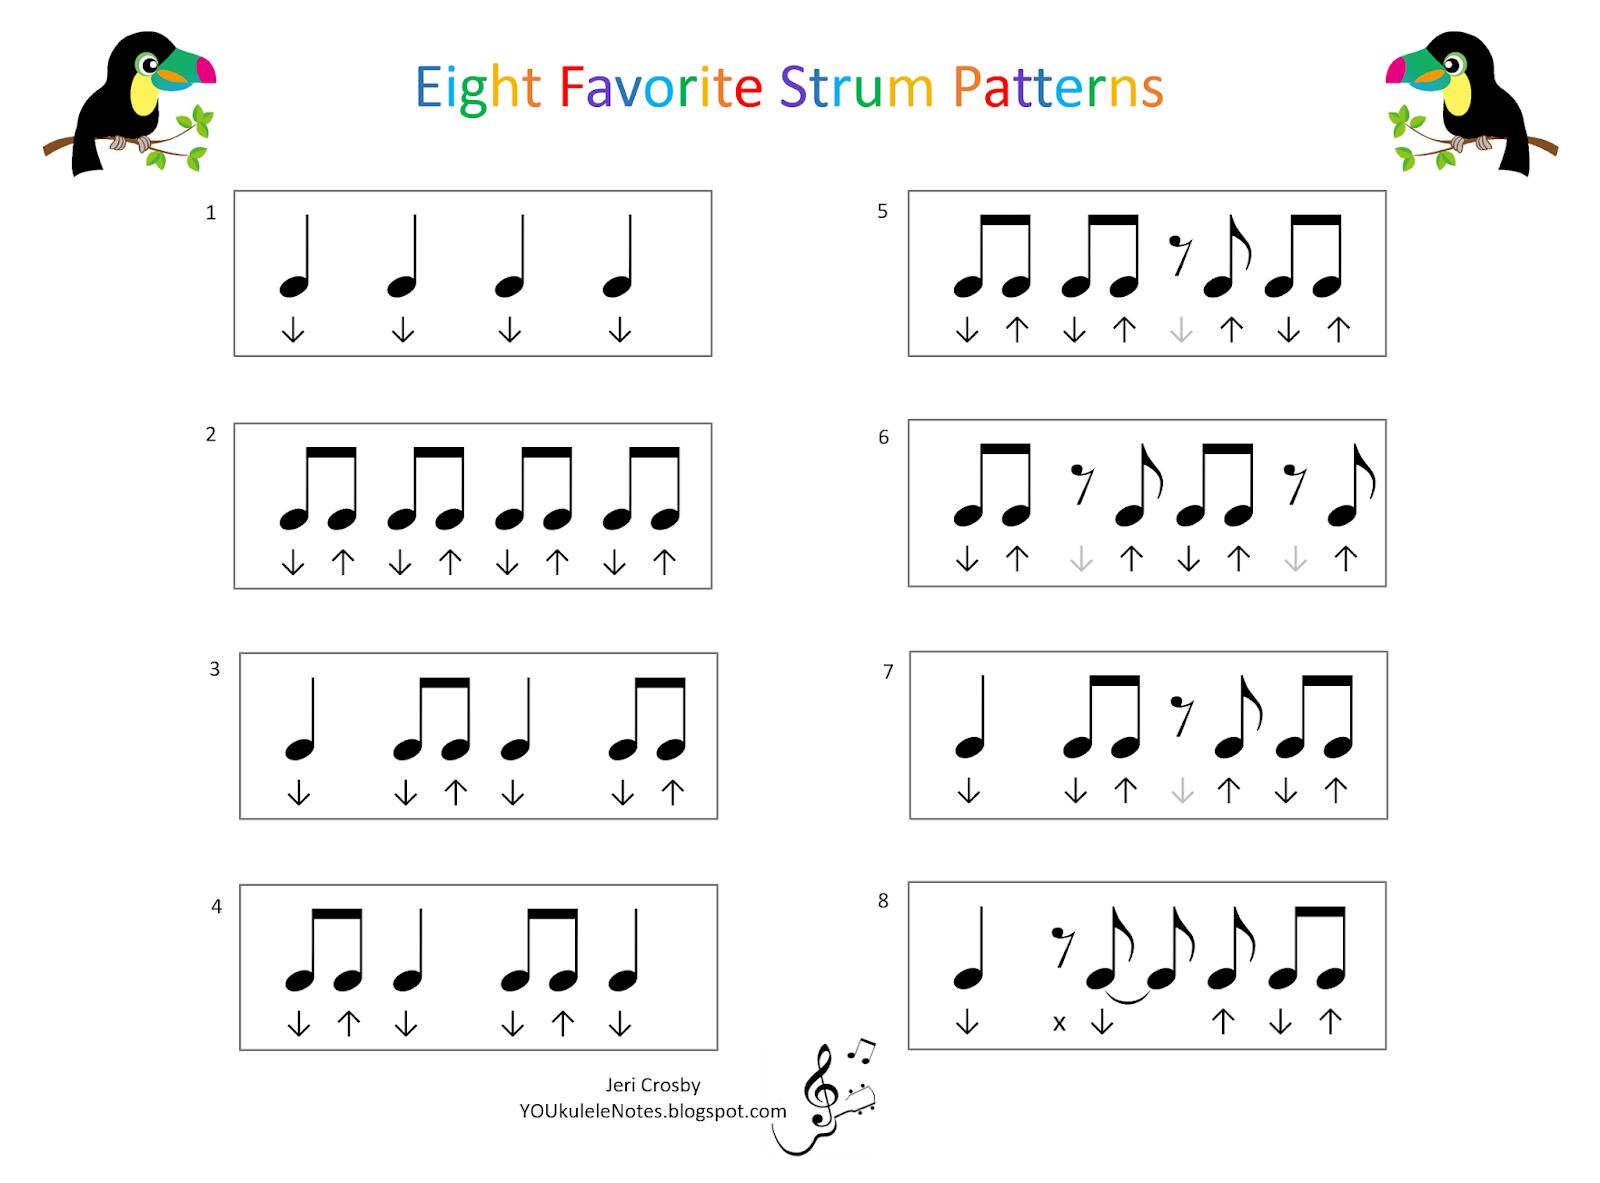 Jeris Youkulele Notes August 2016 Uke Fretboard Diagram Favorite Strum Patterns